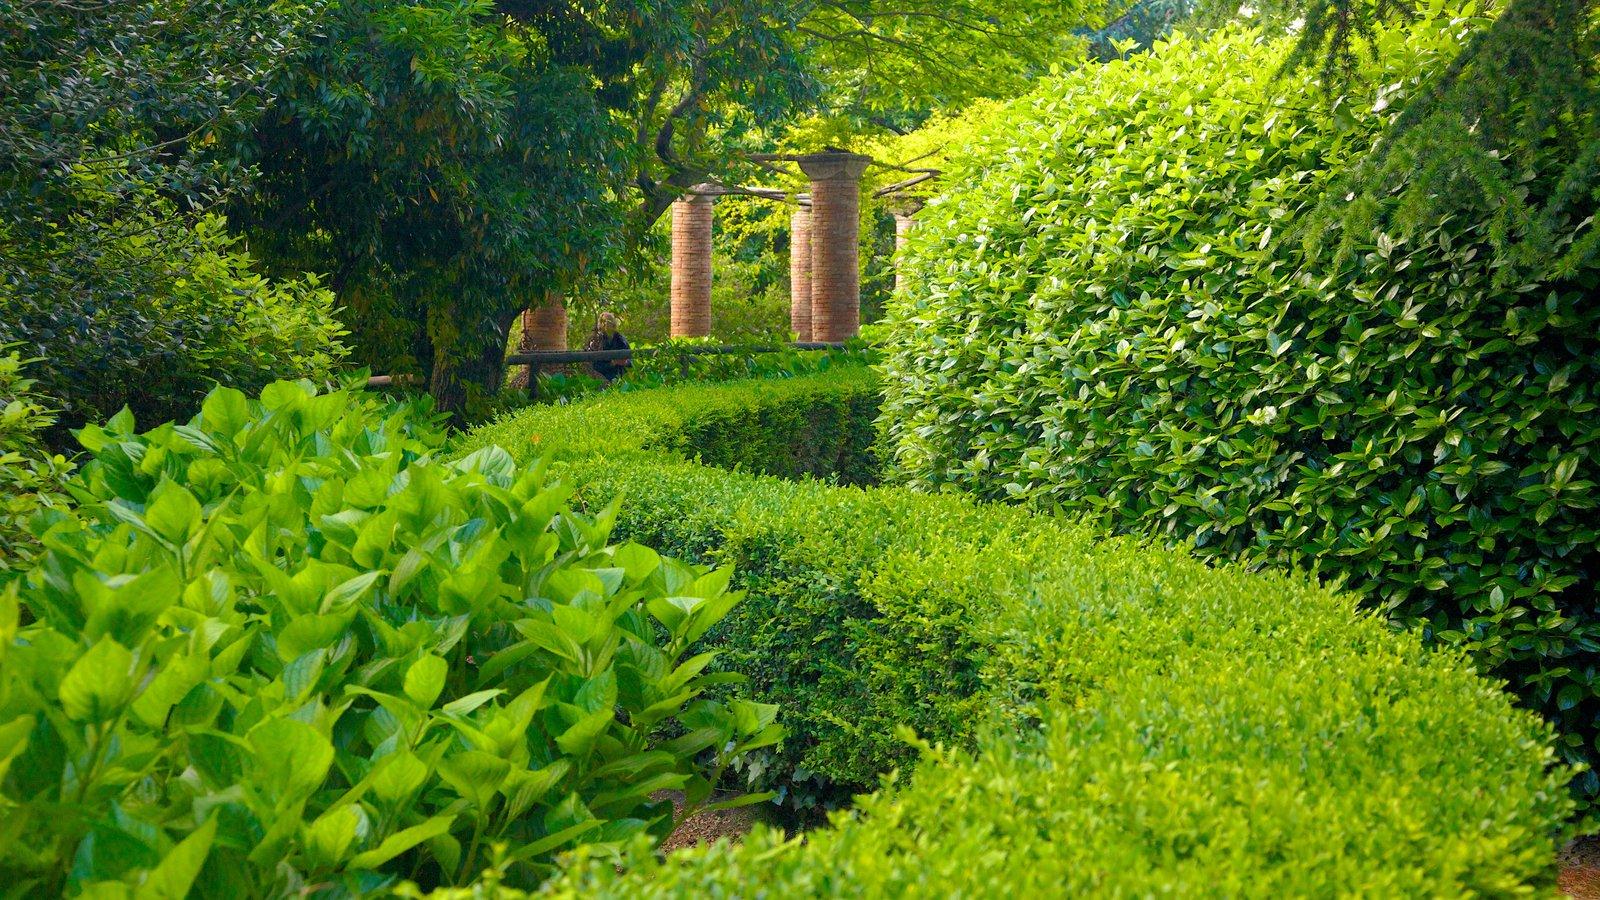 Costa de Amalfi mostrando um jardim